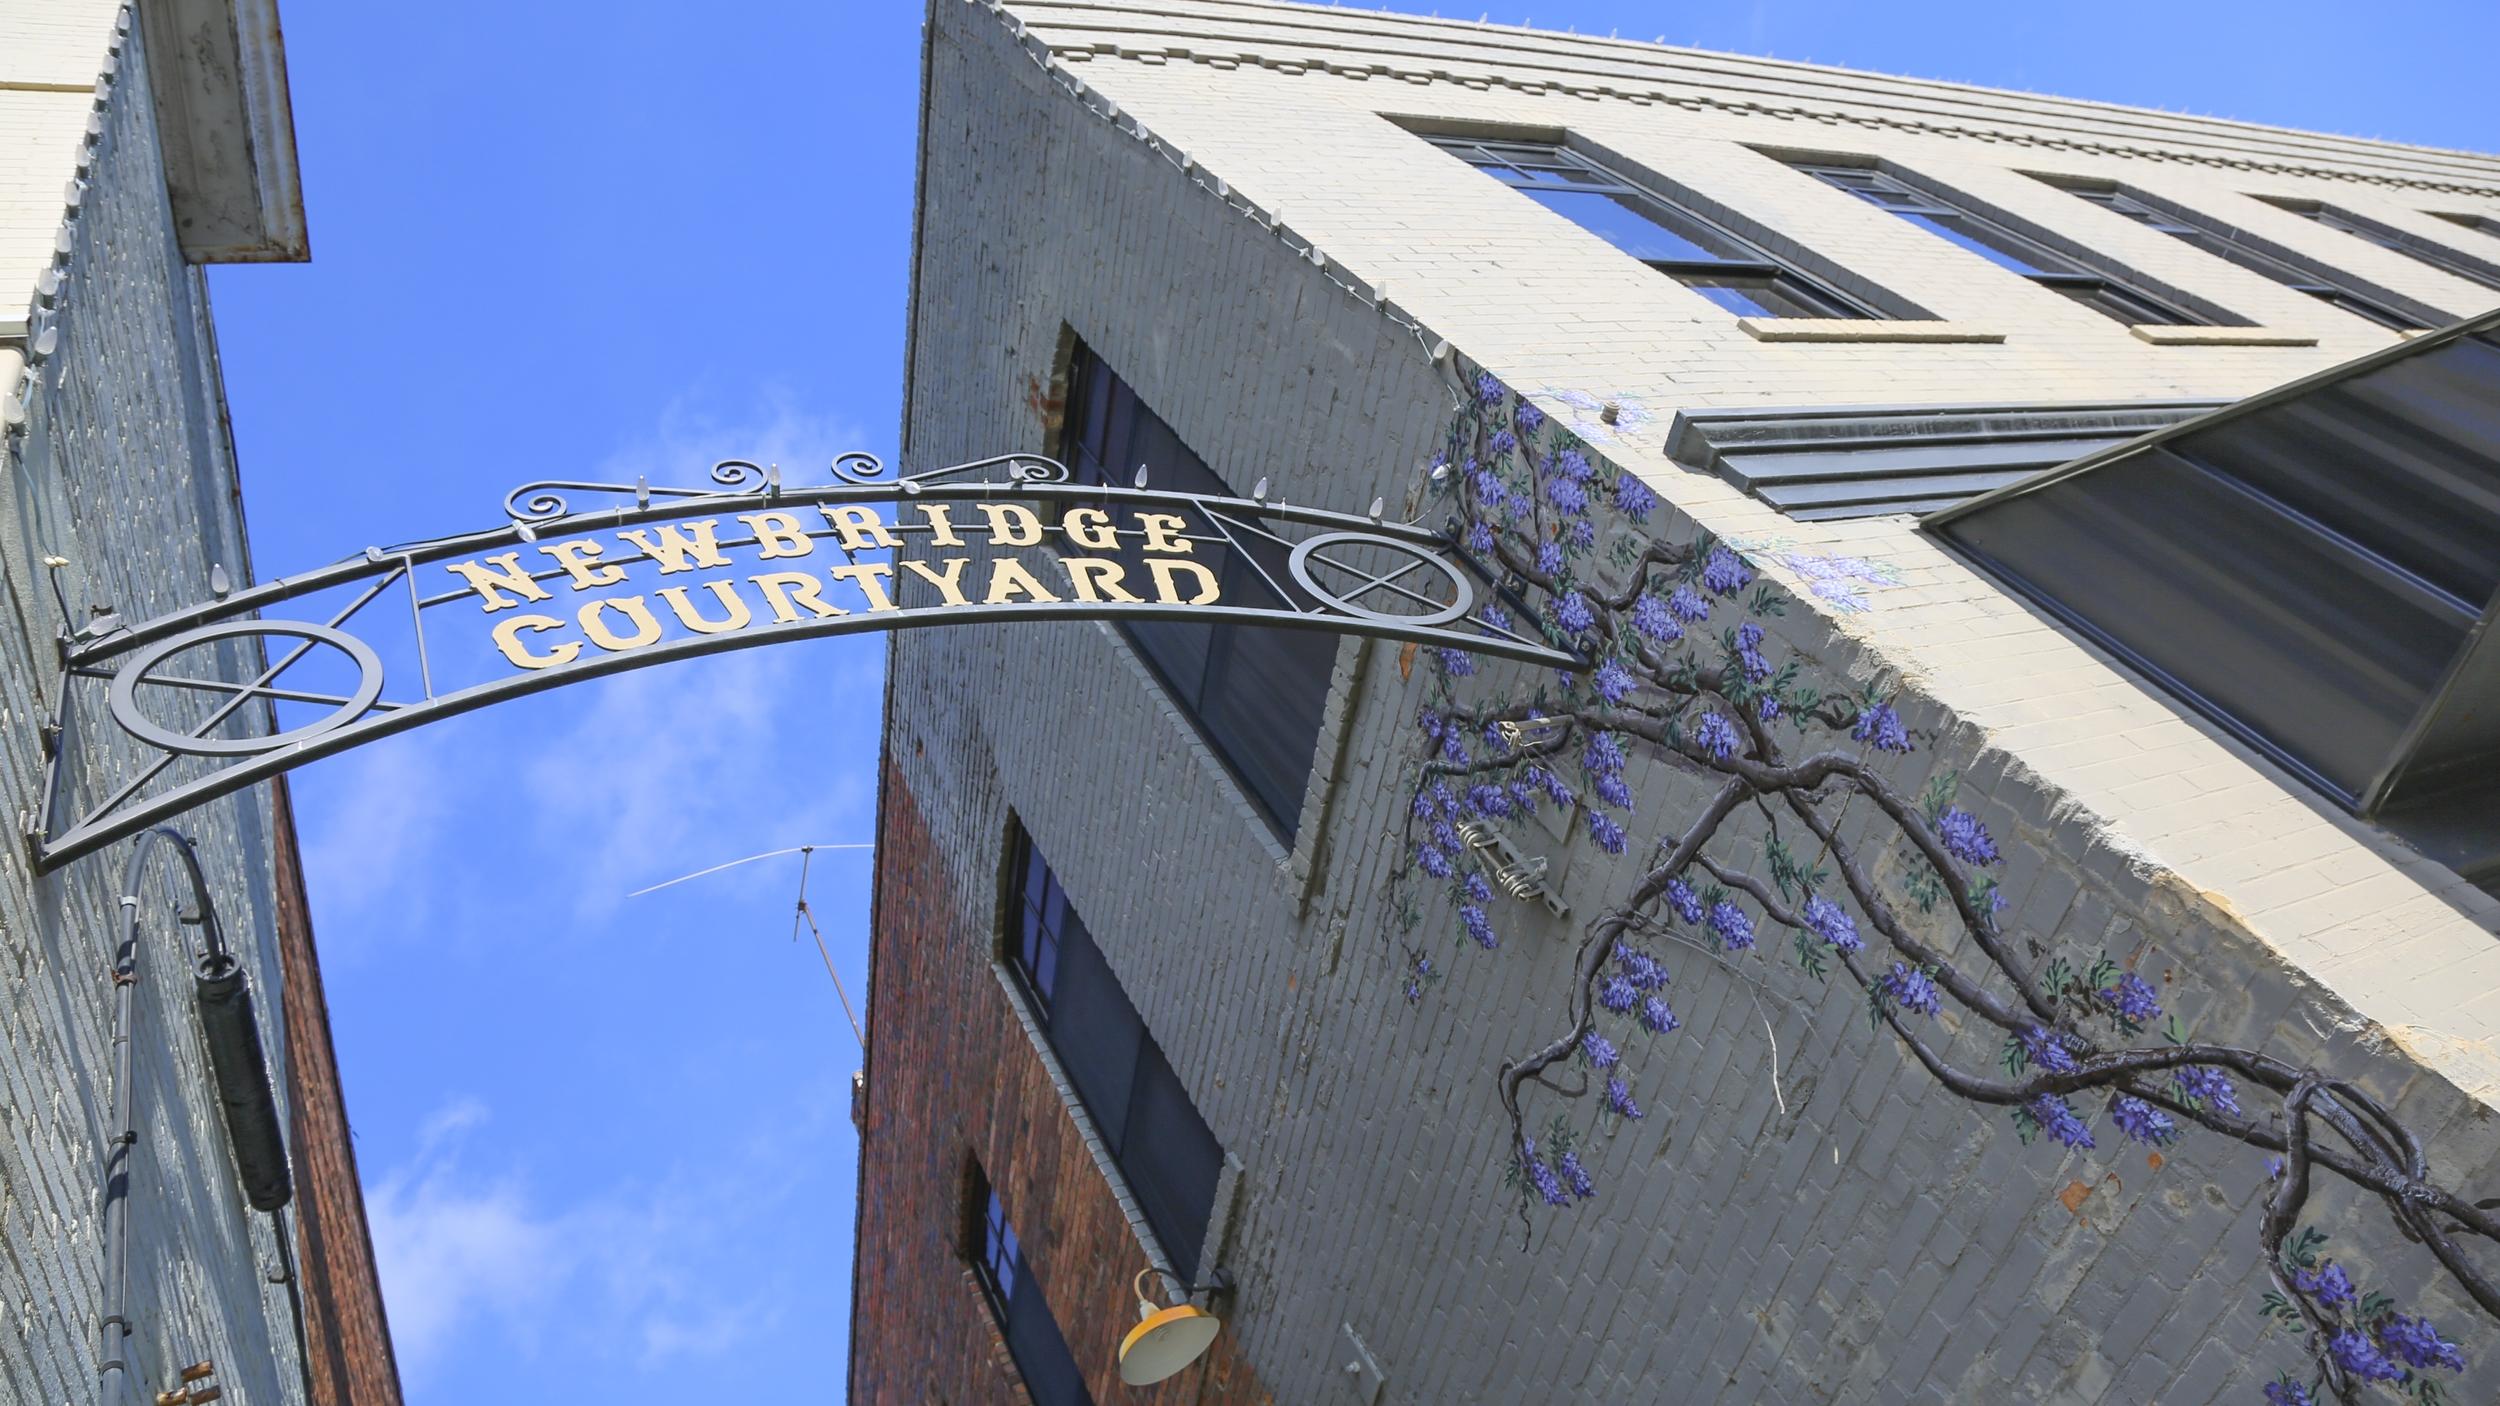 Wisteria at Newbridge Courtyard